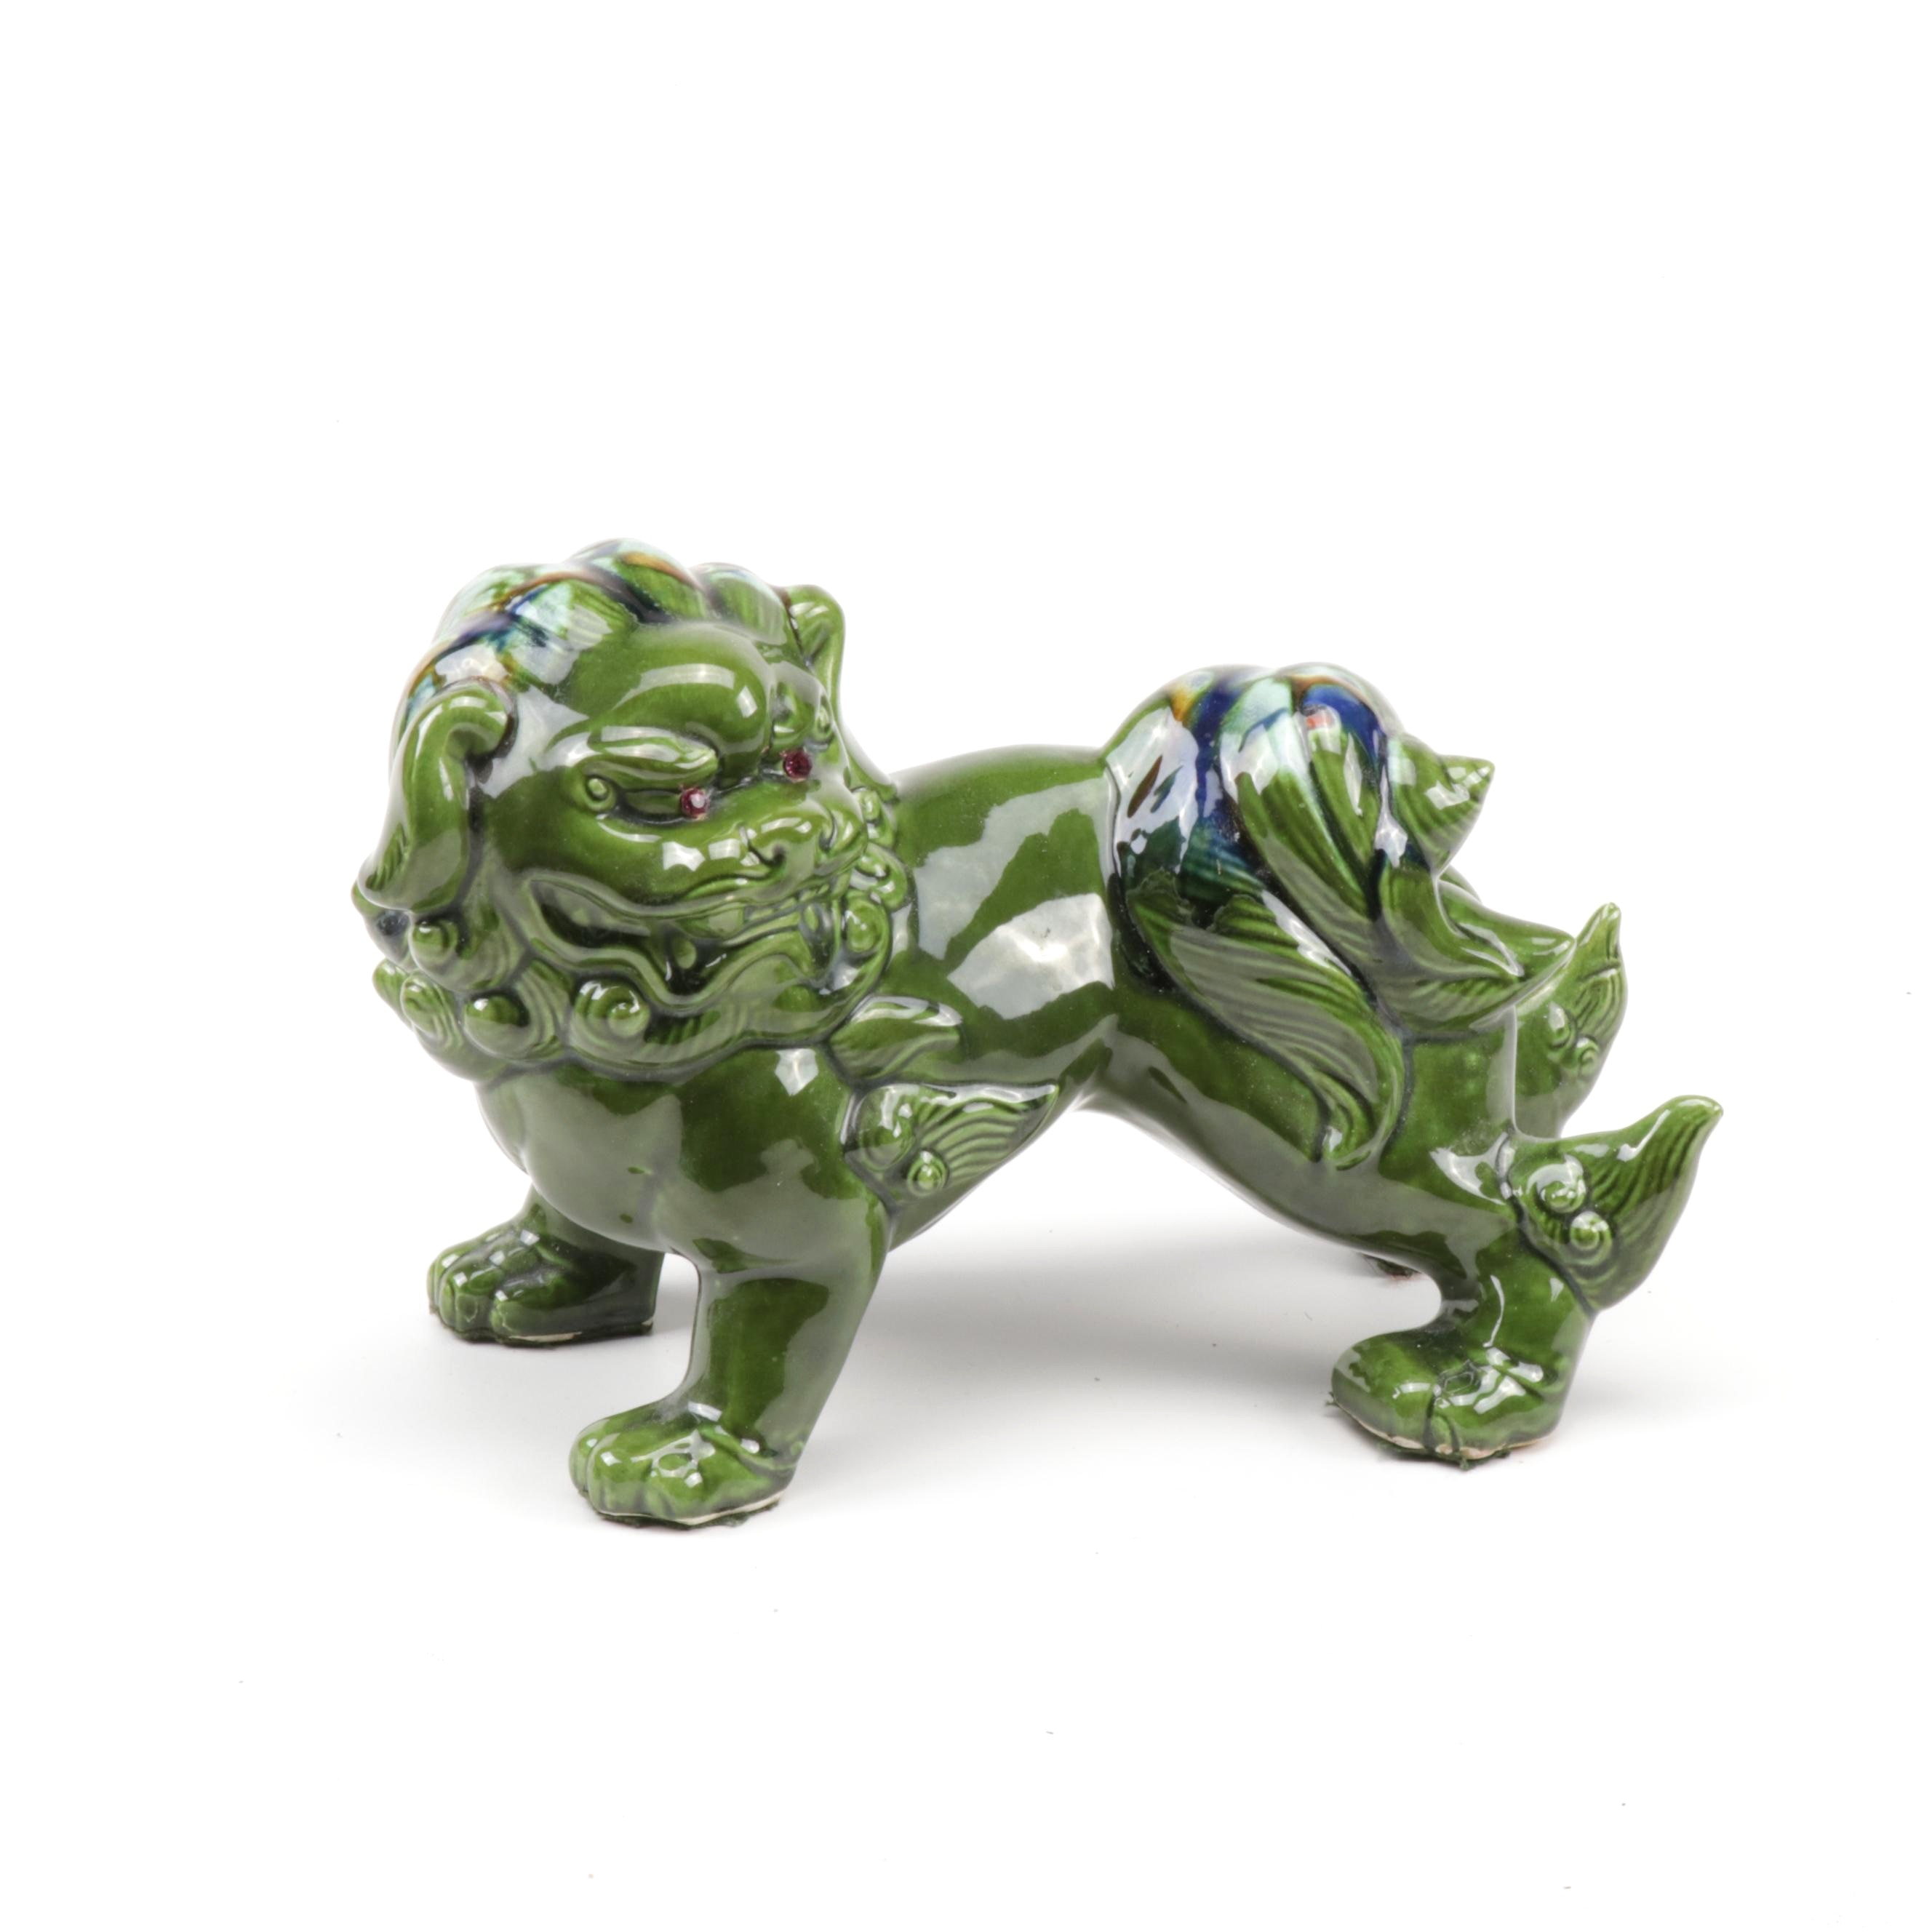 Green Ceramic Guardian Lion Figurine with Rhinestone Eyes